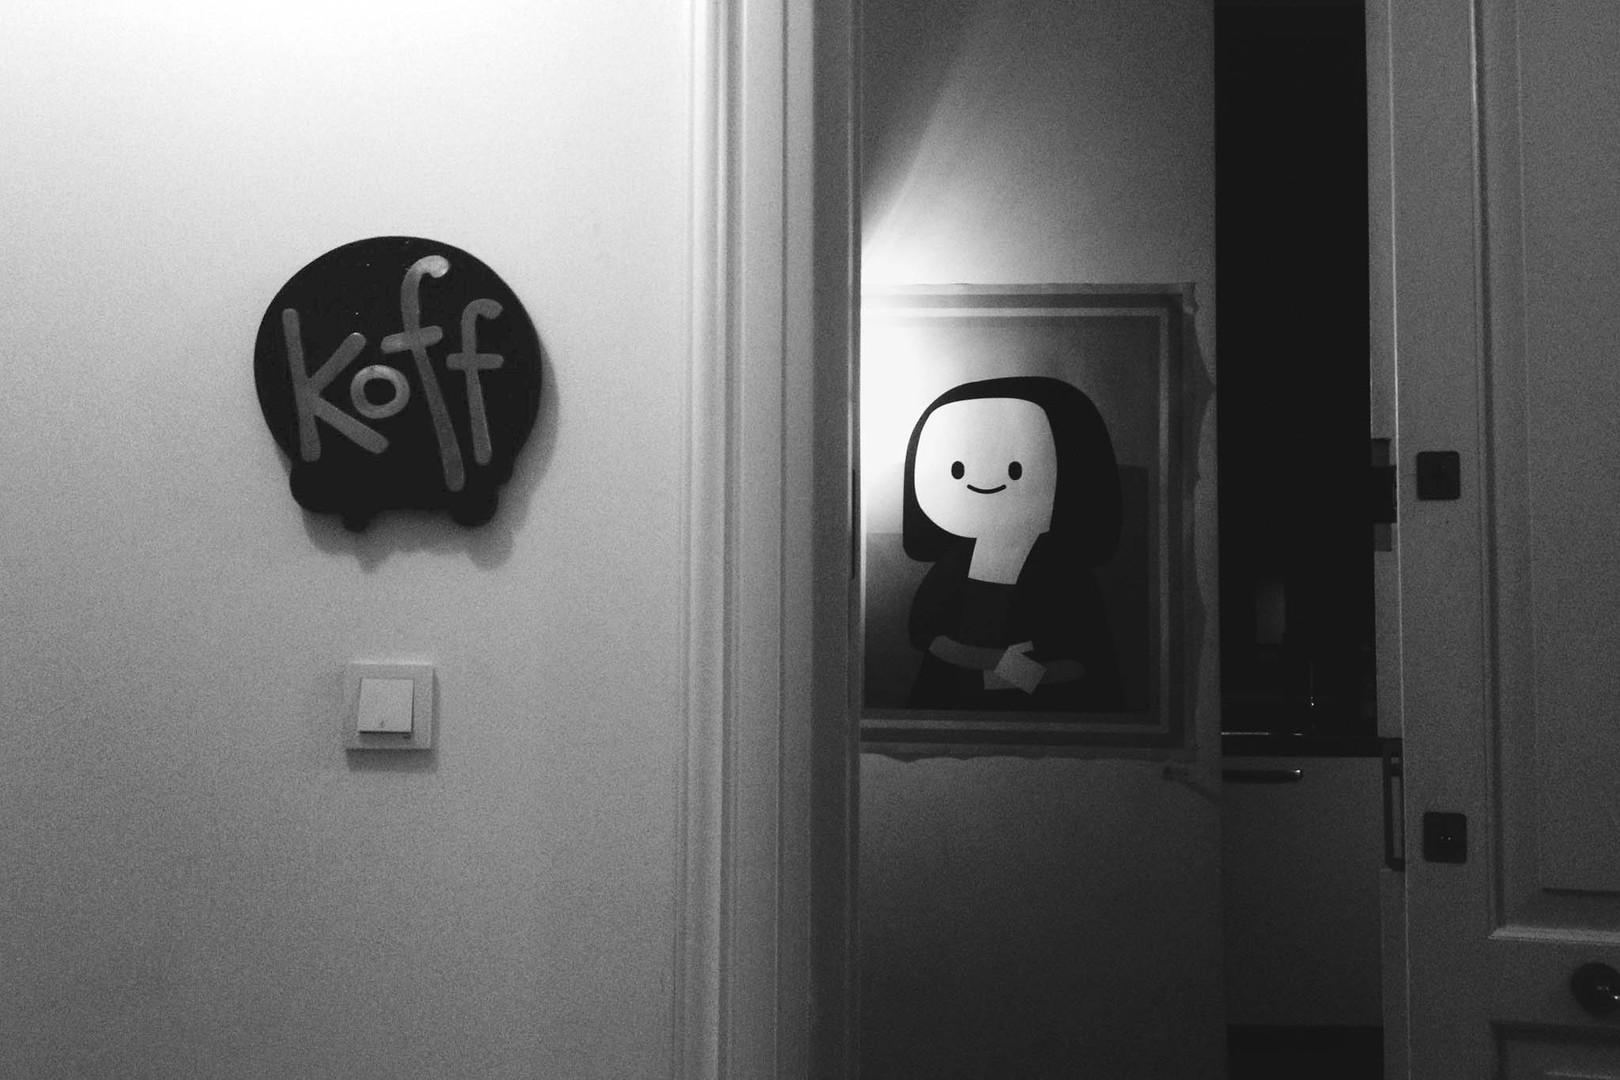 koff_ofis_photo.jpg